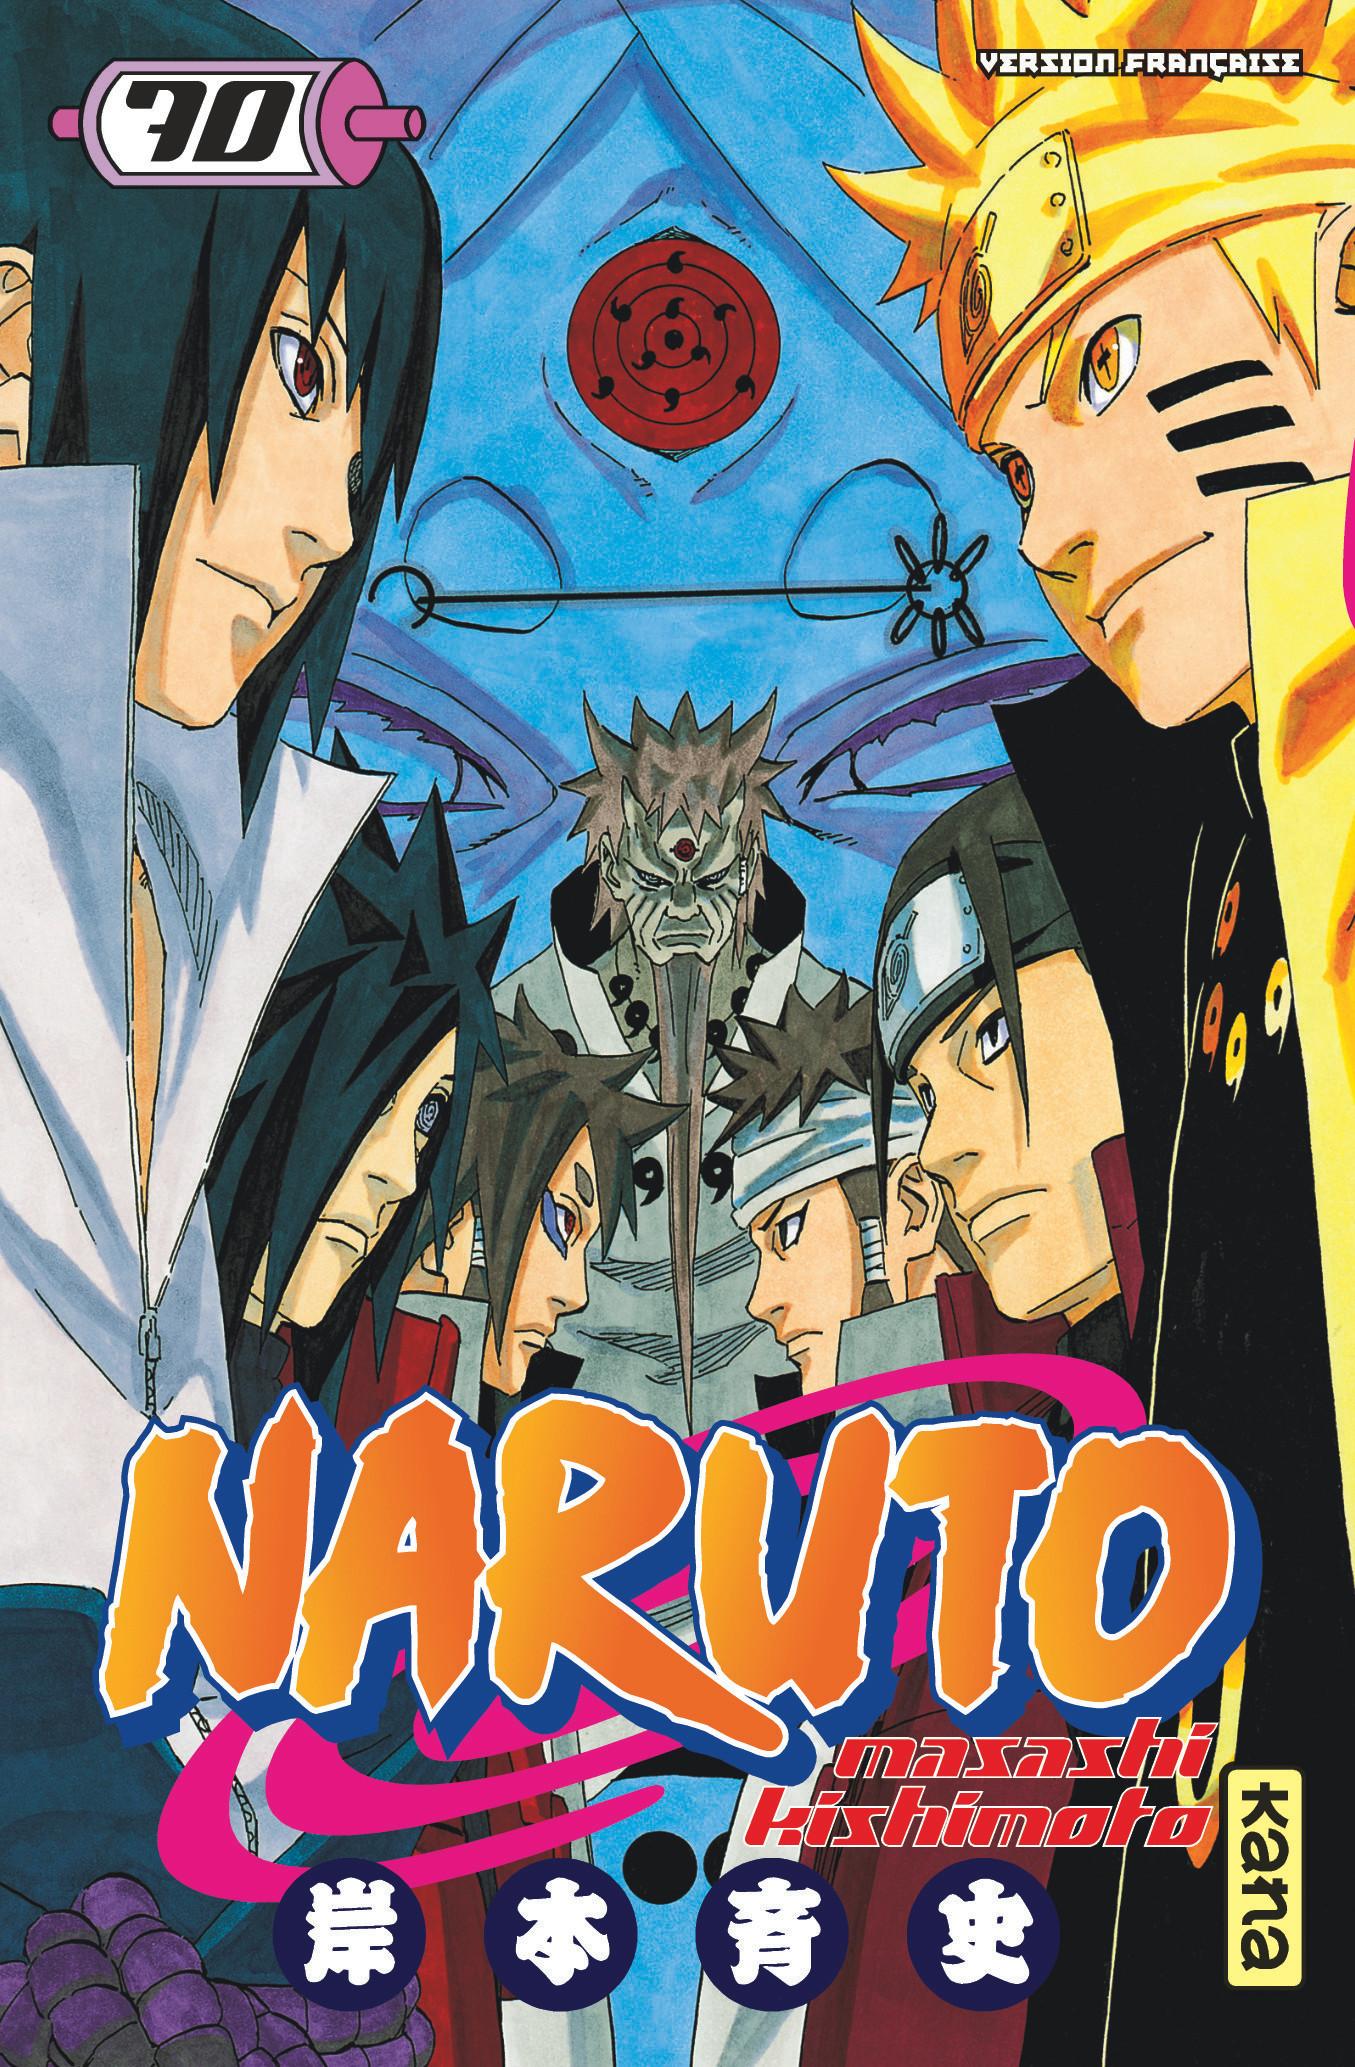 Fairy Tail Manga Naruto 70 233 Dition Fran 231 Aise Kana Manga Sanctuary